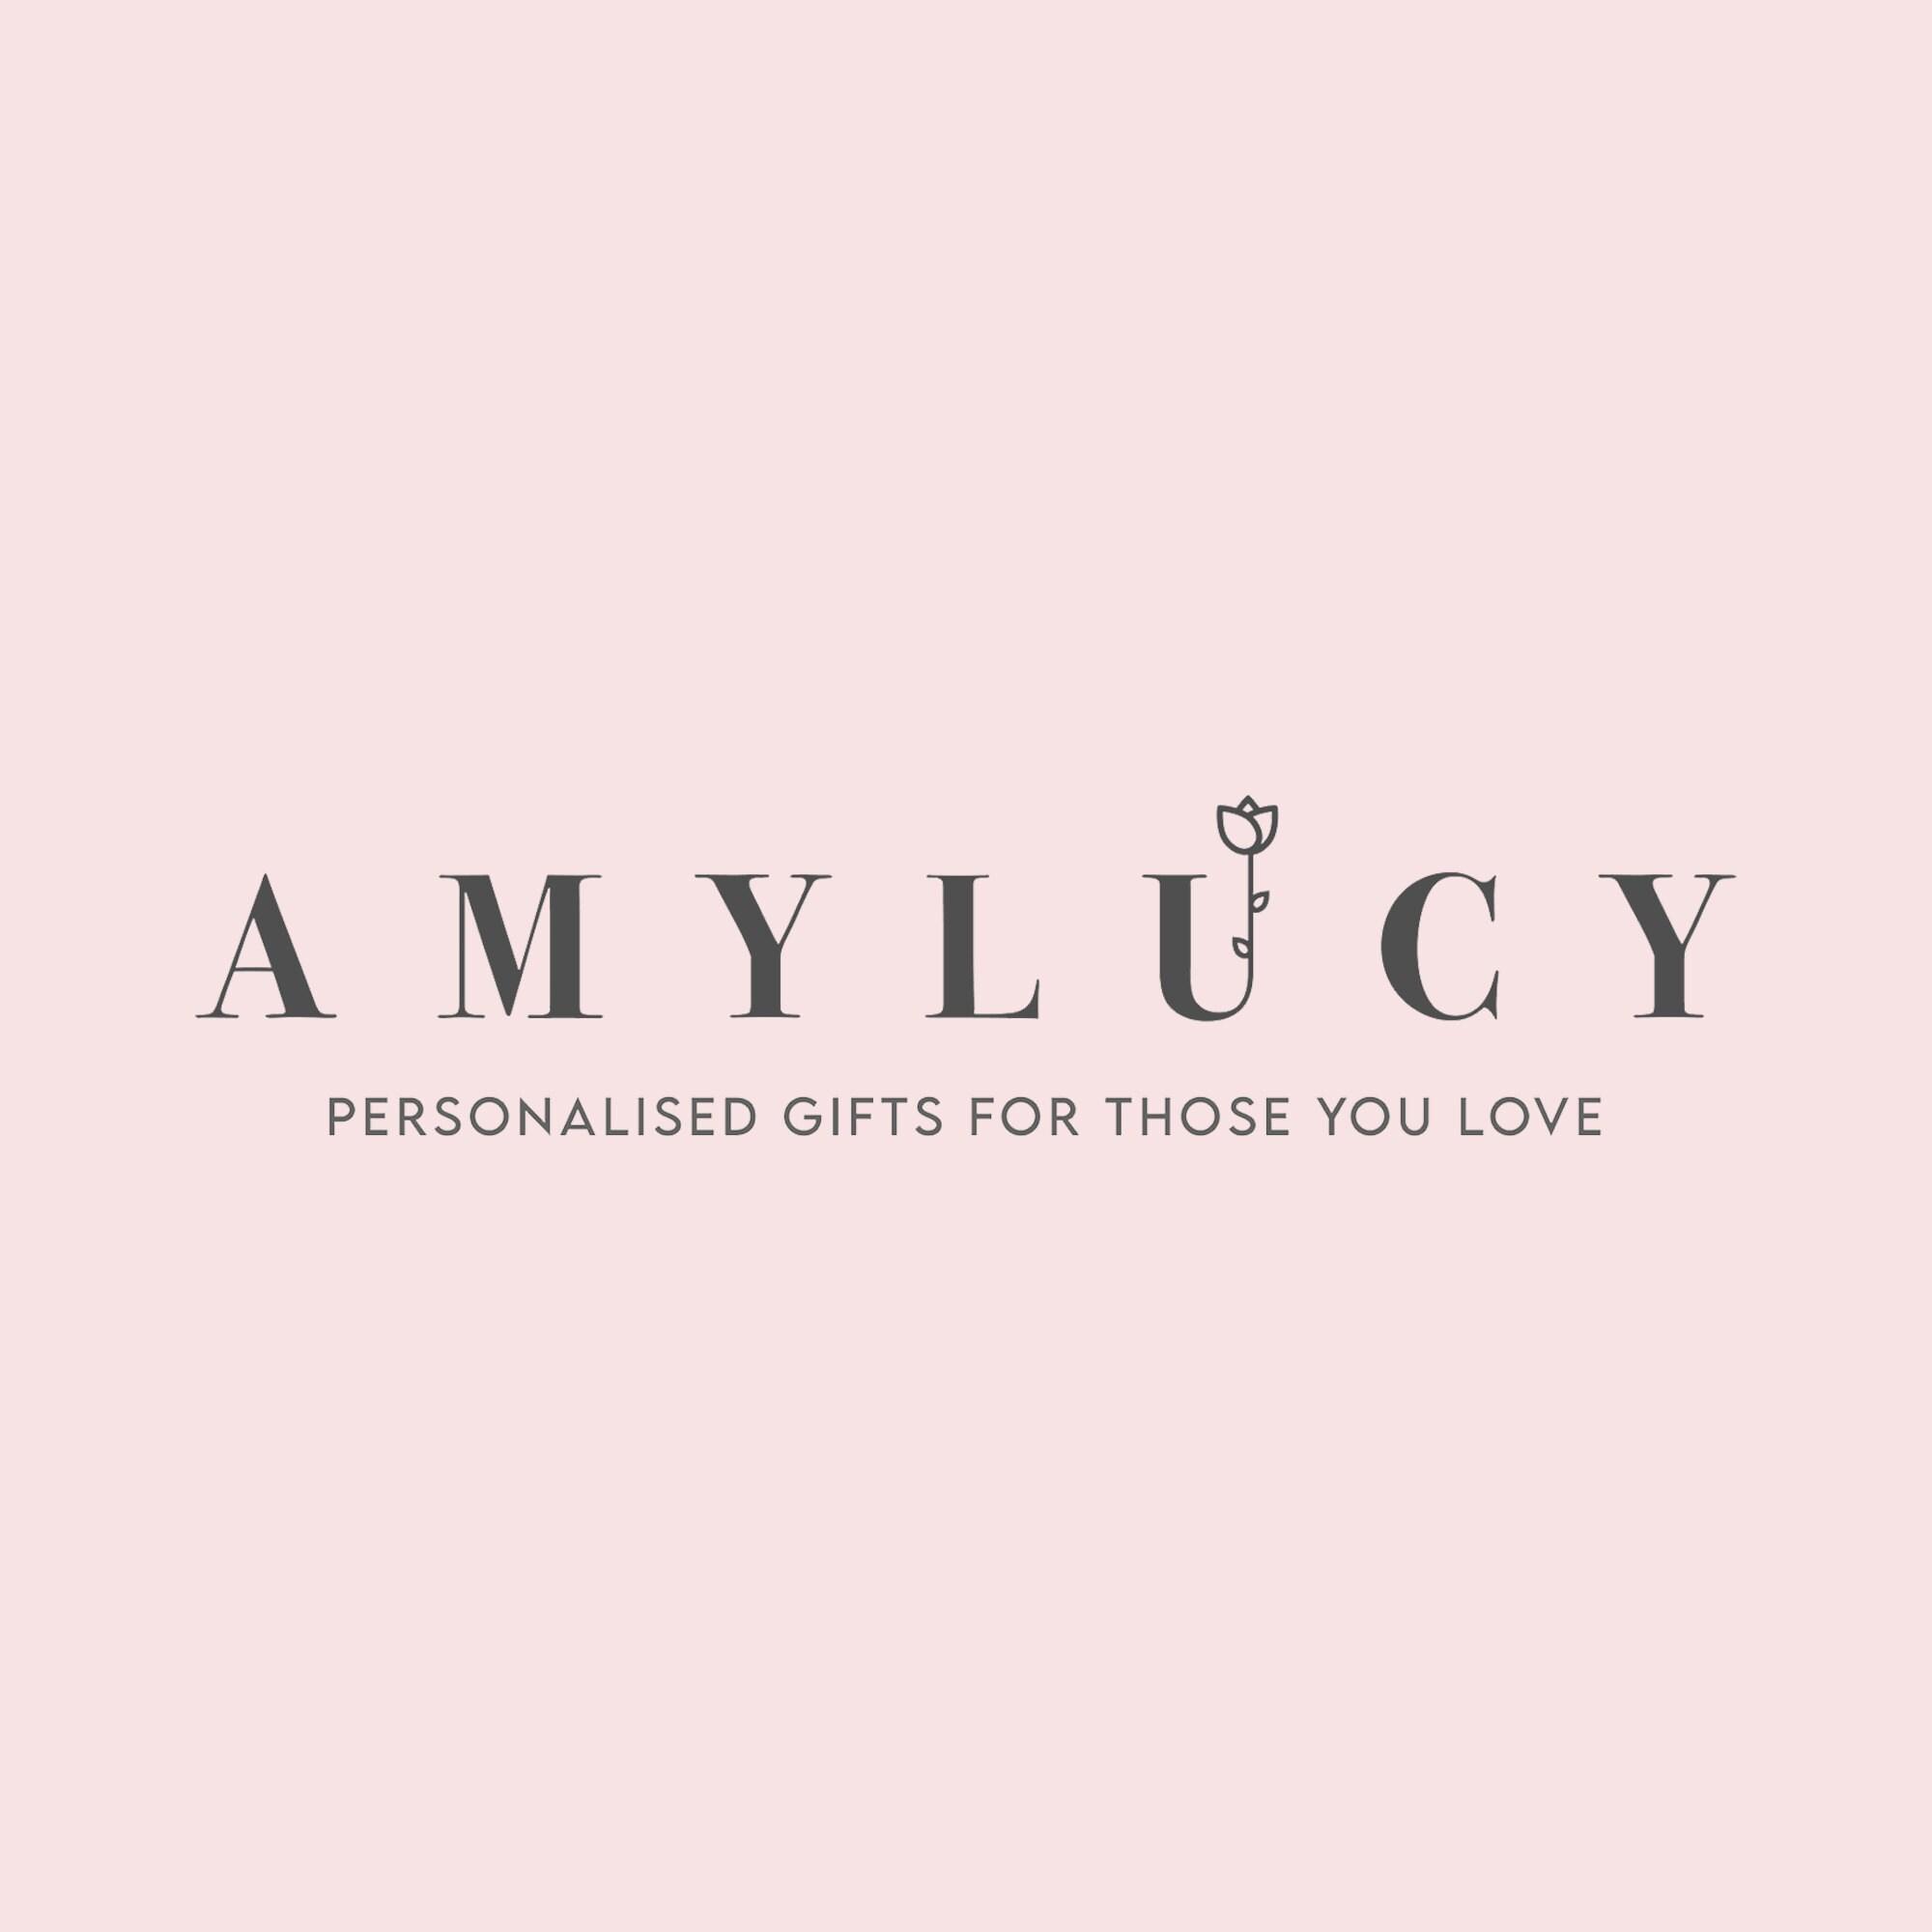 amylucydesigns